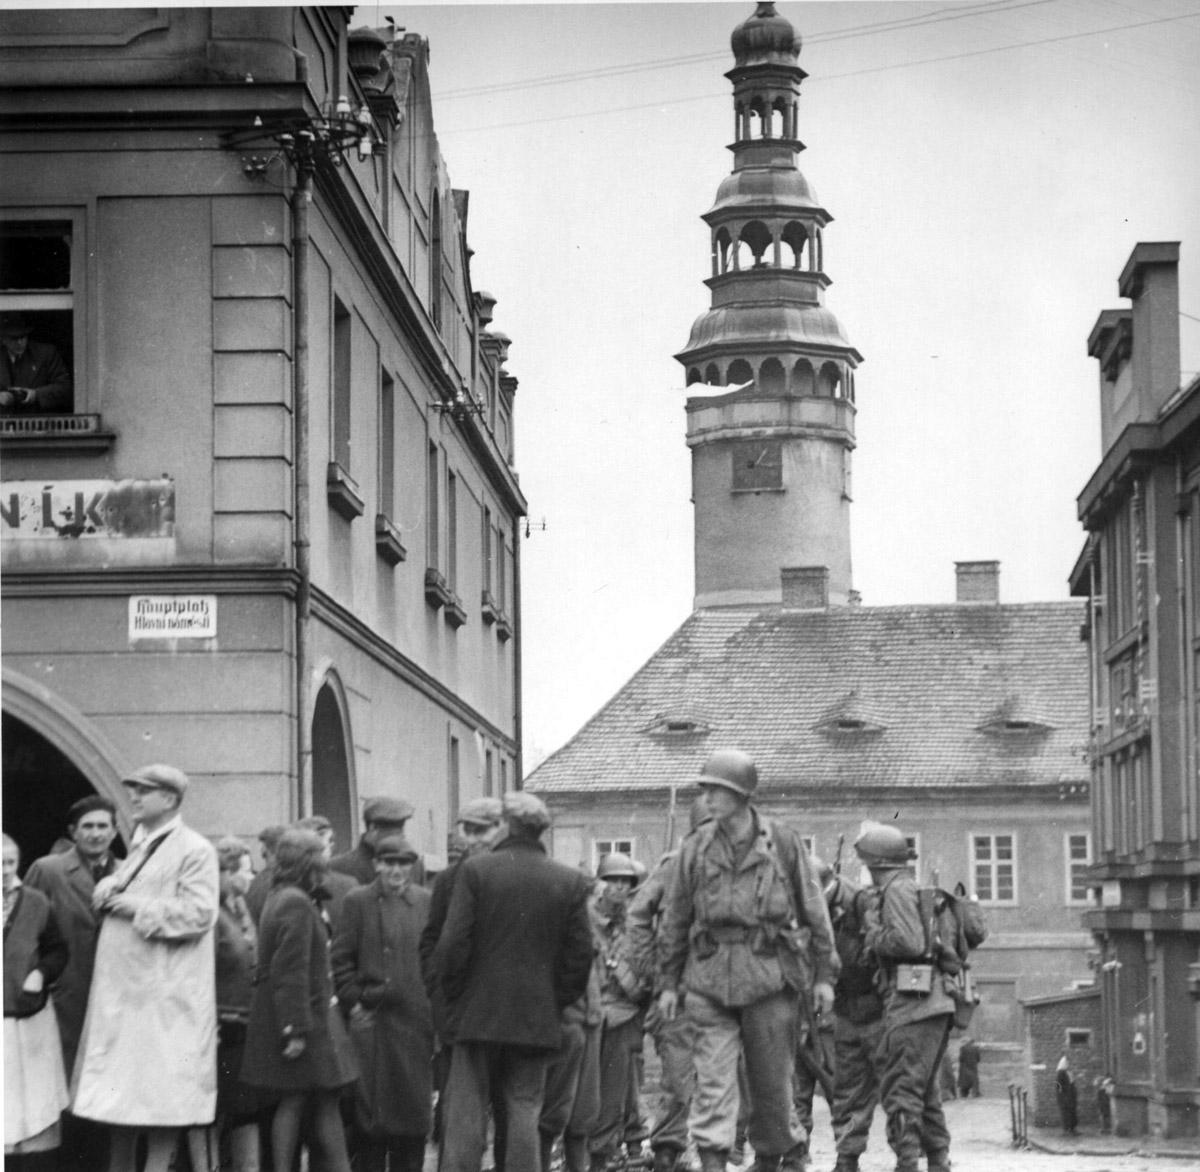 5th May 1945 Domazlice, Czechoslovakia, Europe